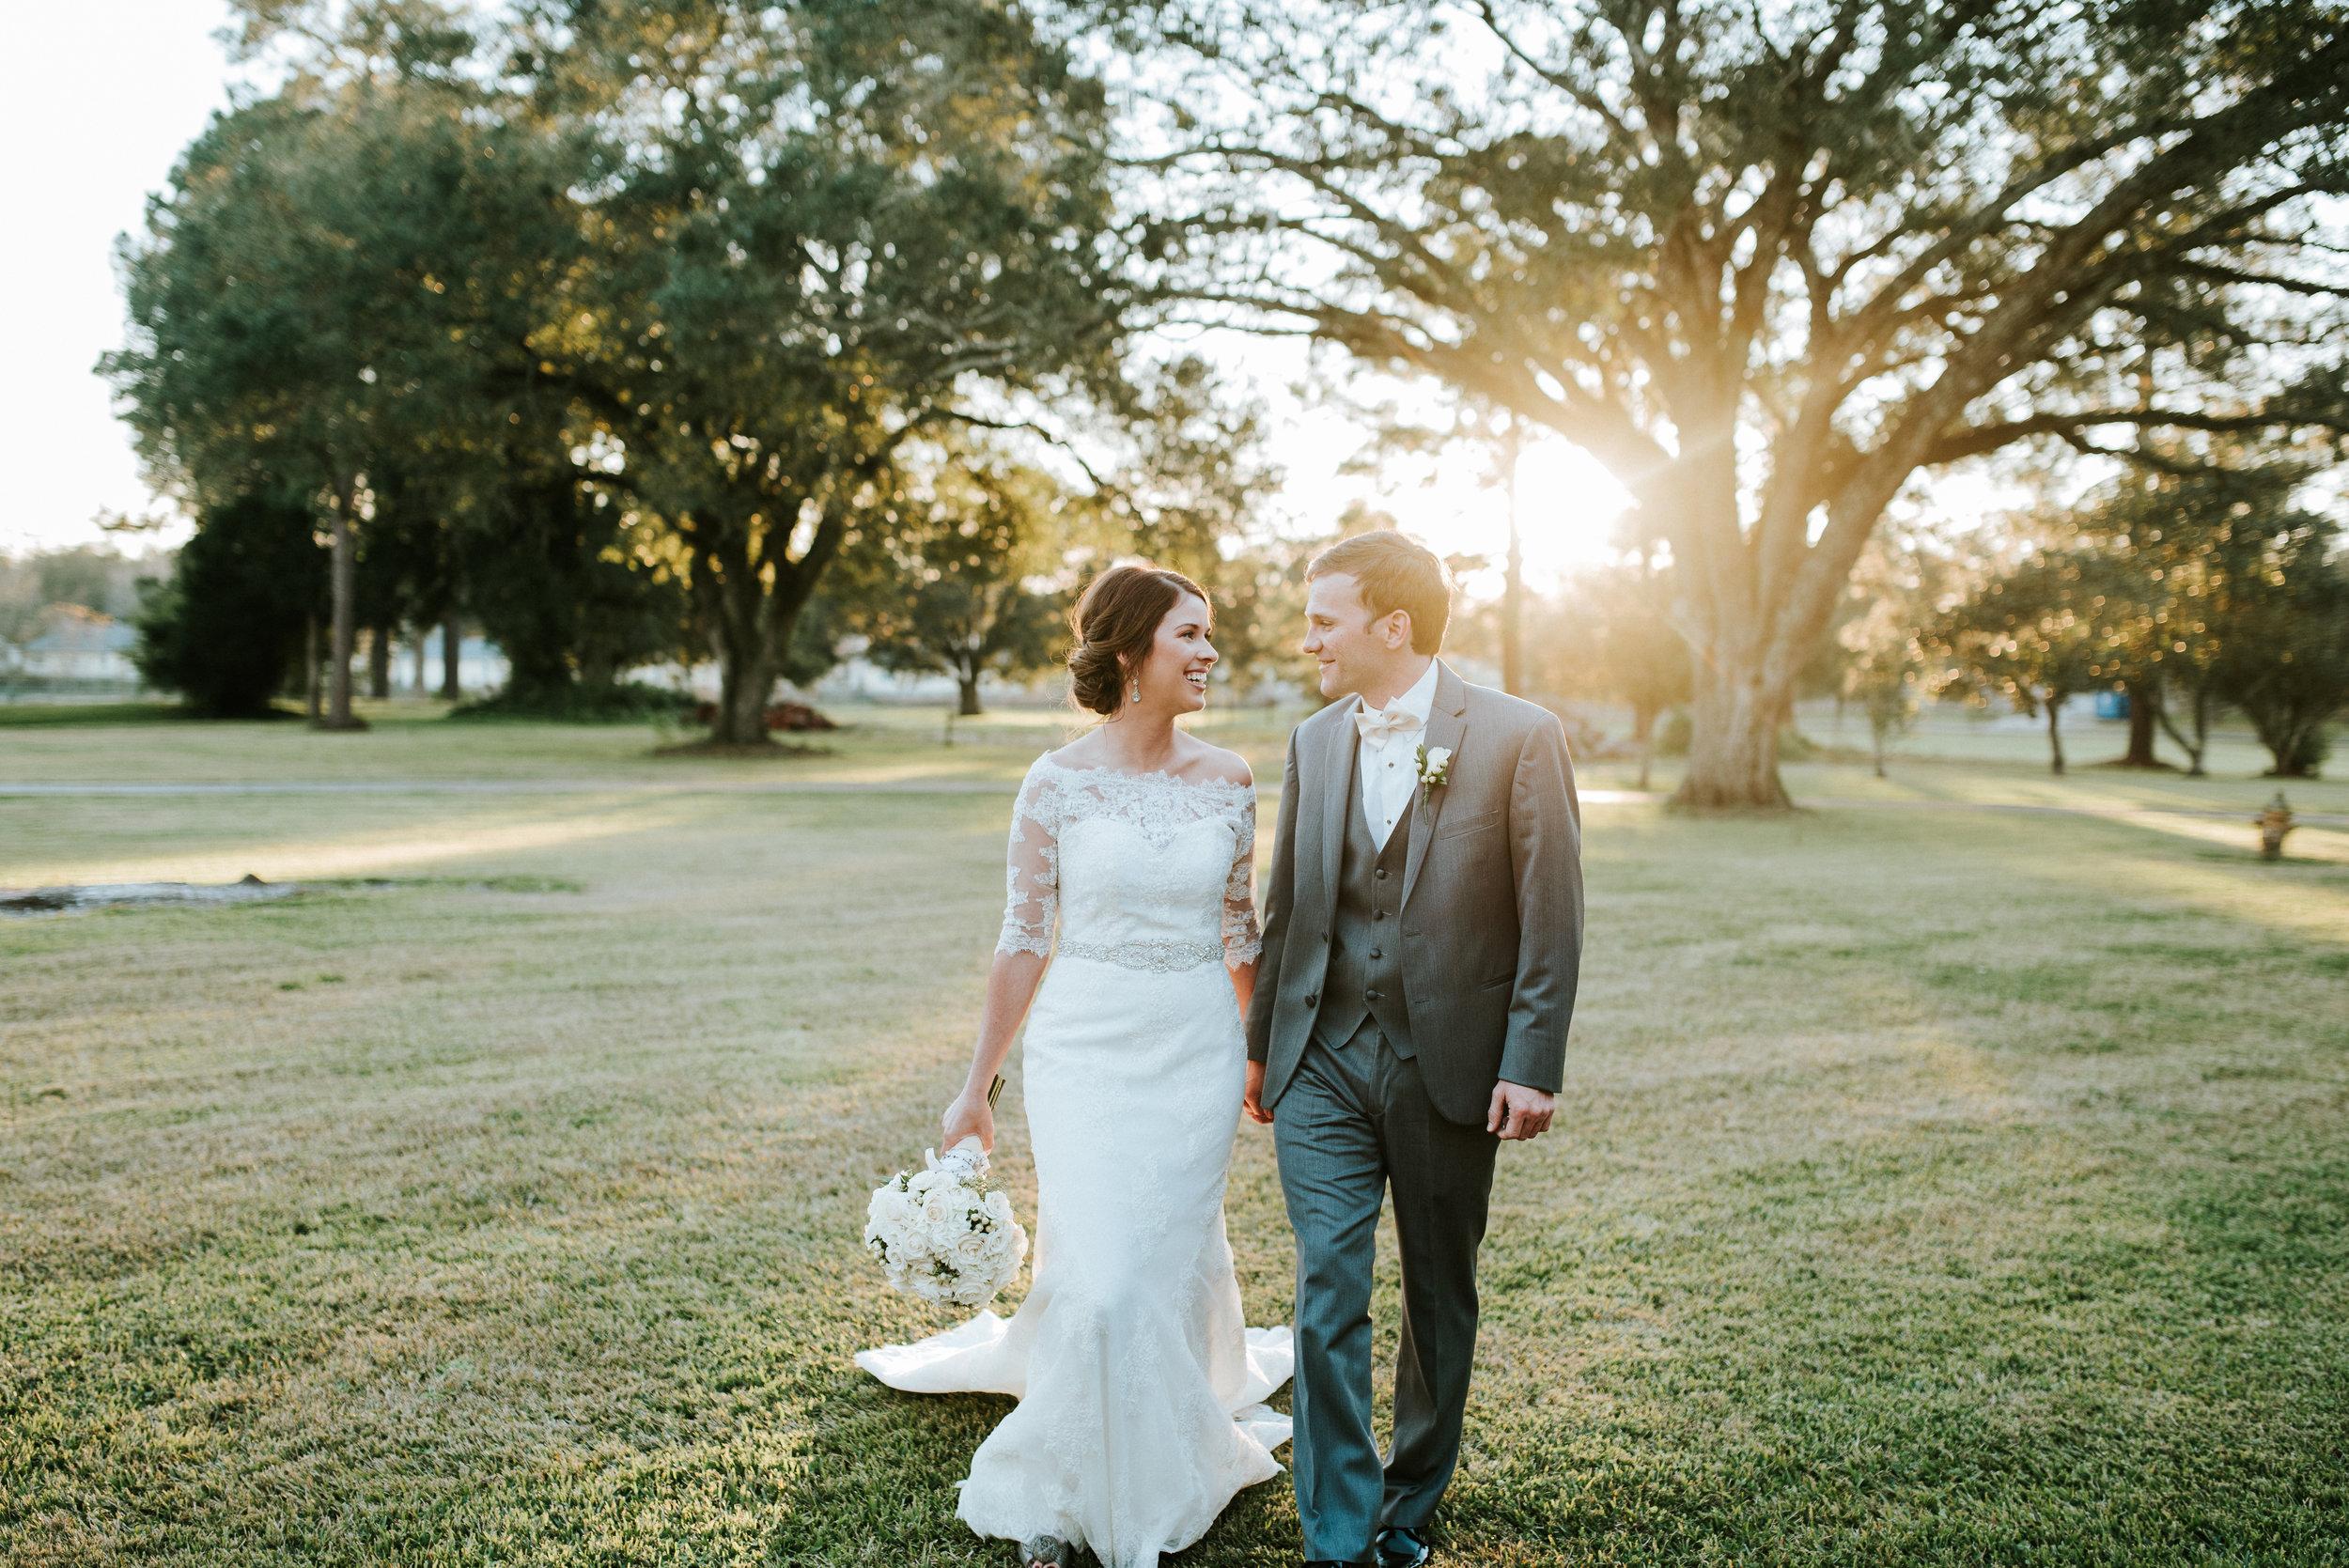 Southern Fete, Southern Wedding, Outside Wedding Photos, Hannah Mulligan Photography